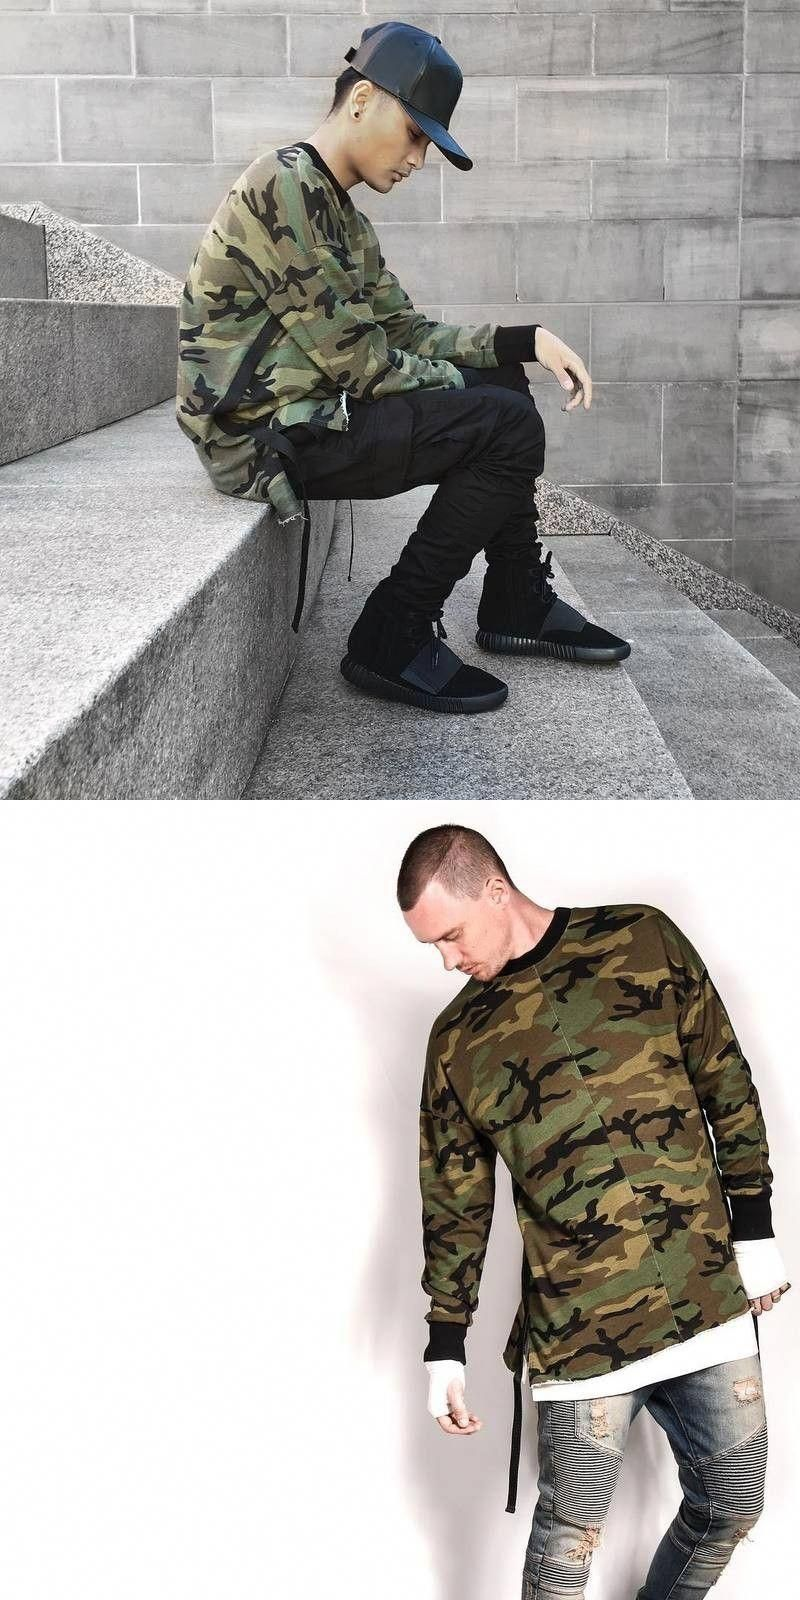 698ec522fbaa7 2017 hip hop justin bieber clothes street wear kpop urban clothing men long  sleeve longline t